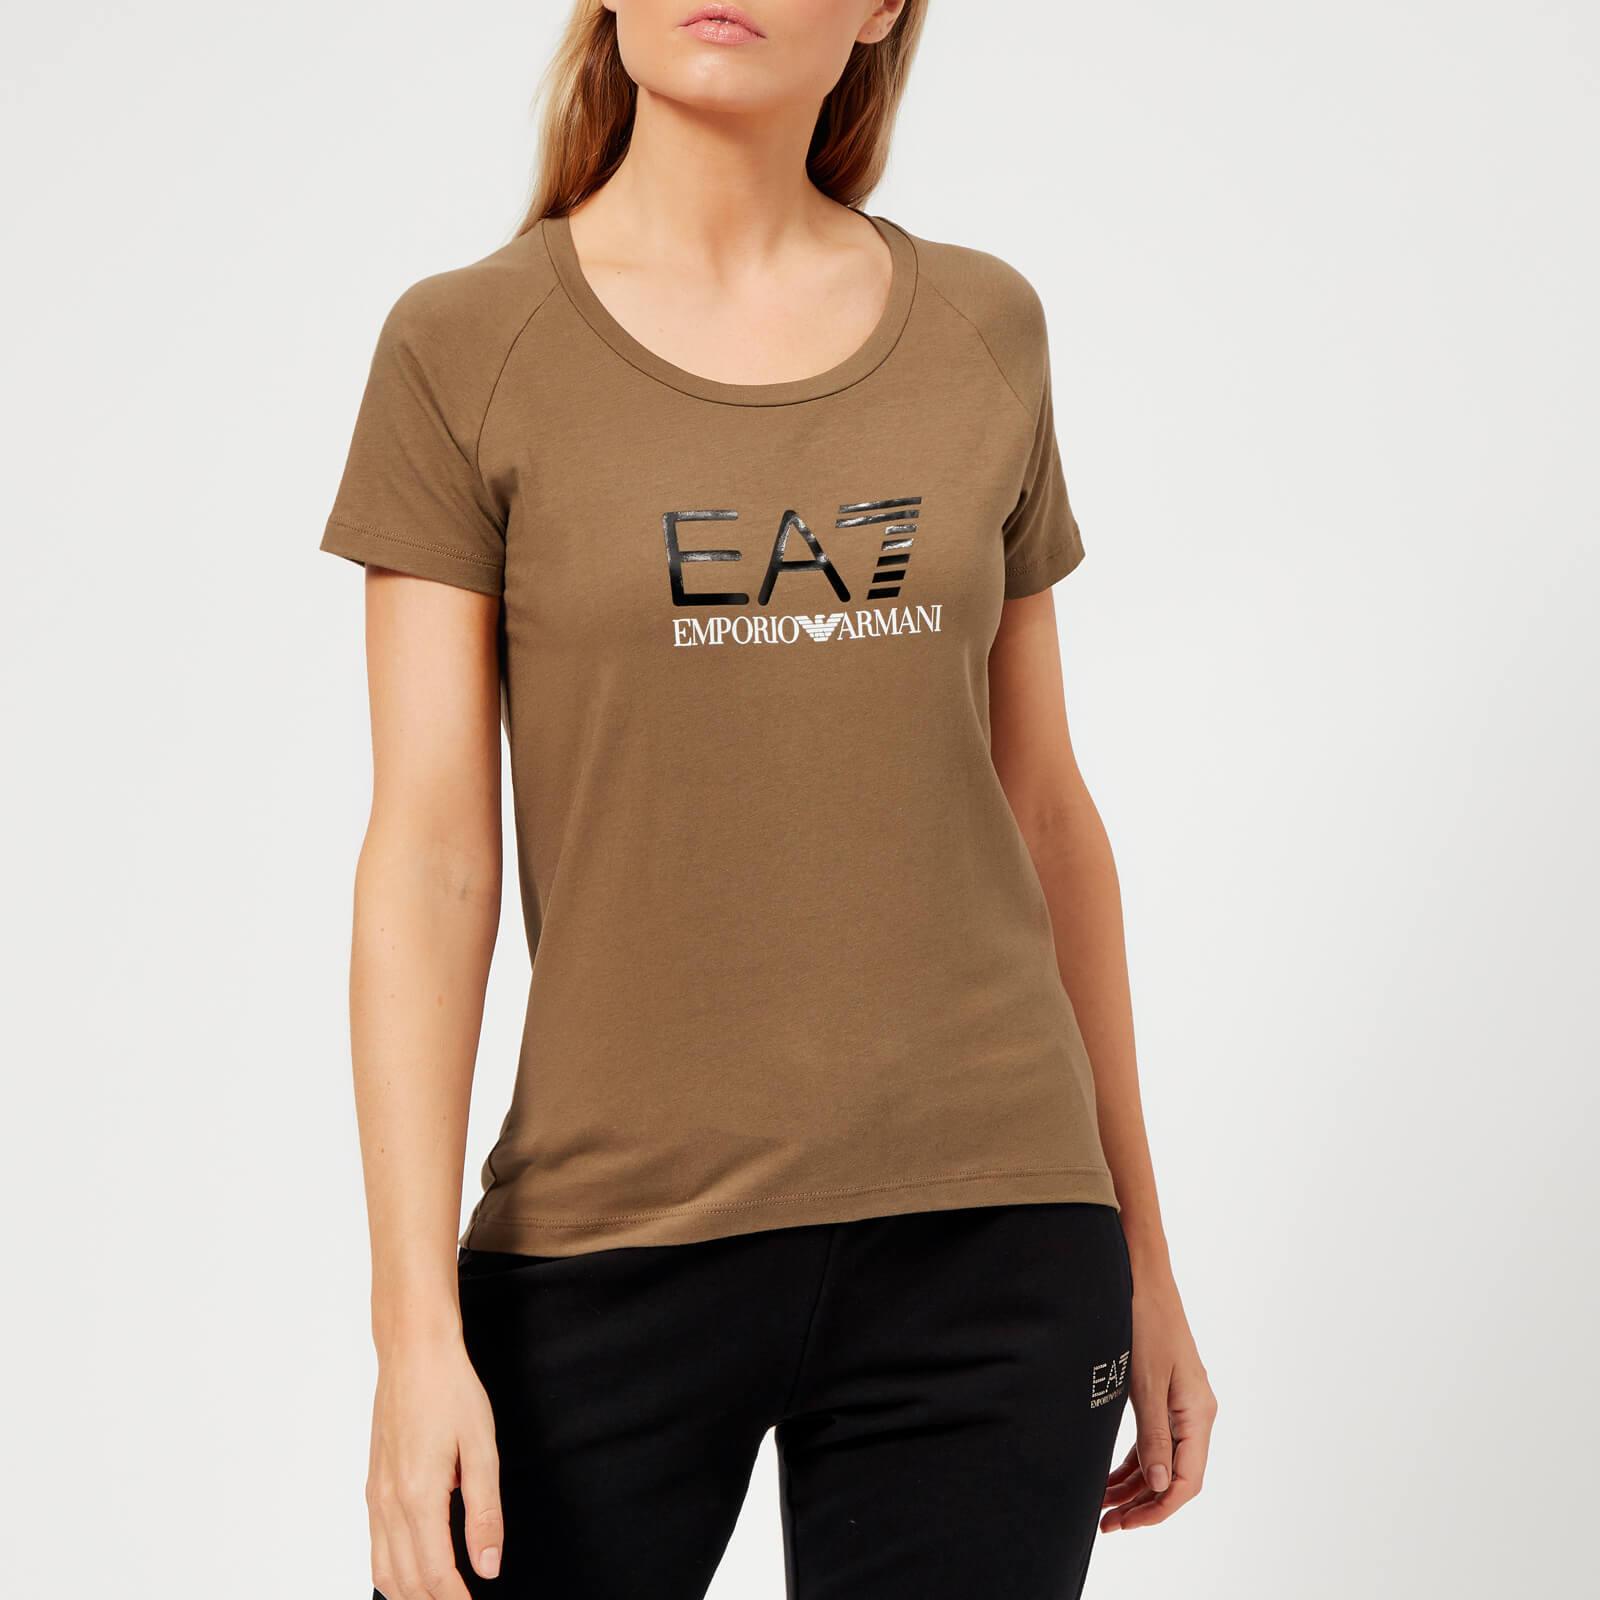 b154c7ef0 ... Emporio Armani EA7 Women's Train Logo Series Shiny Print T-Shirt -  Stone Grey